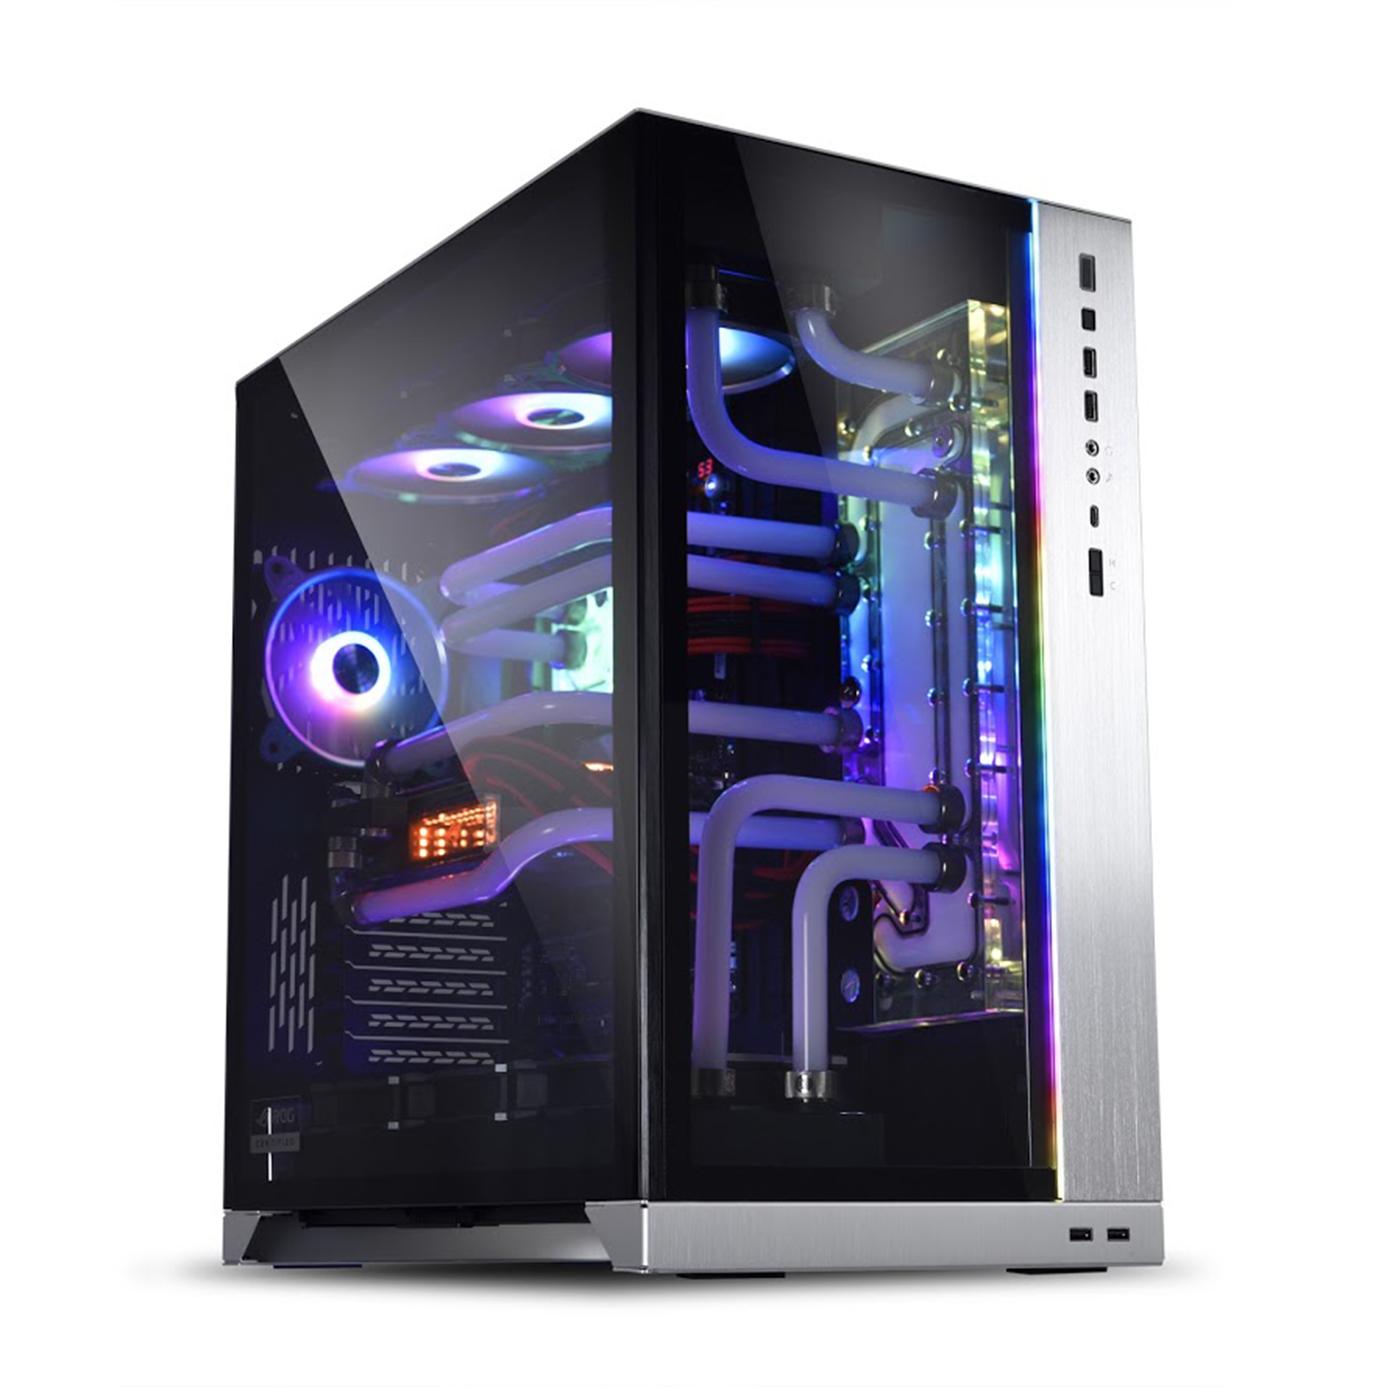 Lian Li PC-O11 Dynamic XL ROG Certify Silver - Black E-ATX / ATX / M-ATX (steel & aluminium) PC Case - LIAN LI 2.35.65.00.005